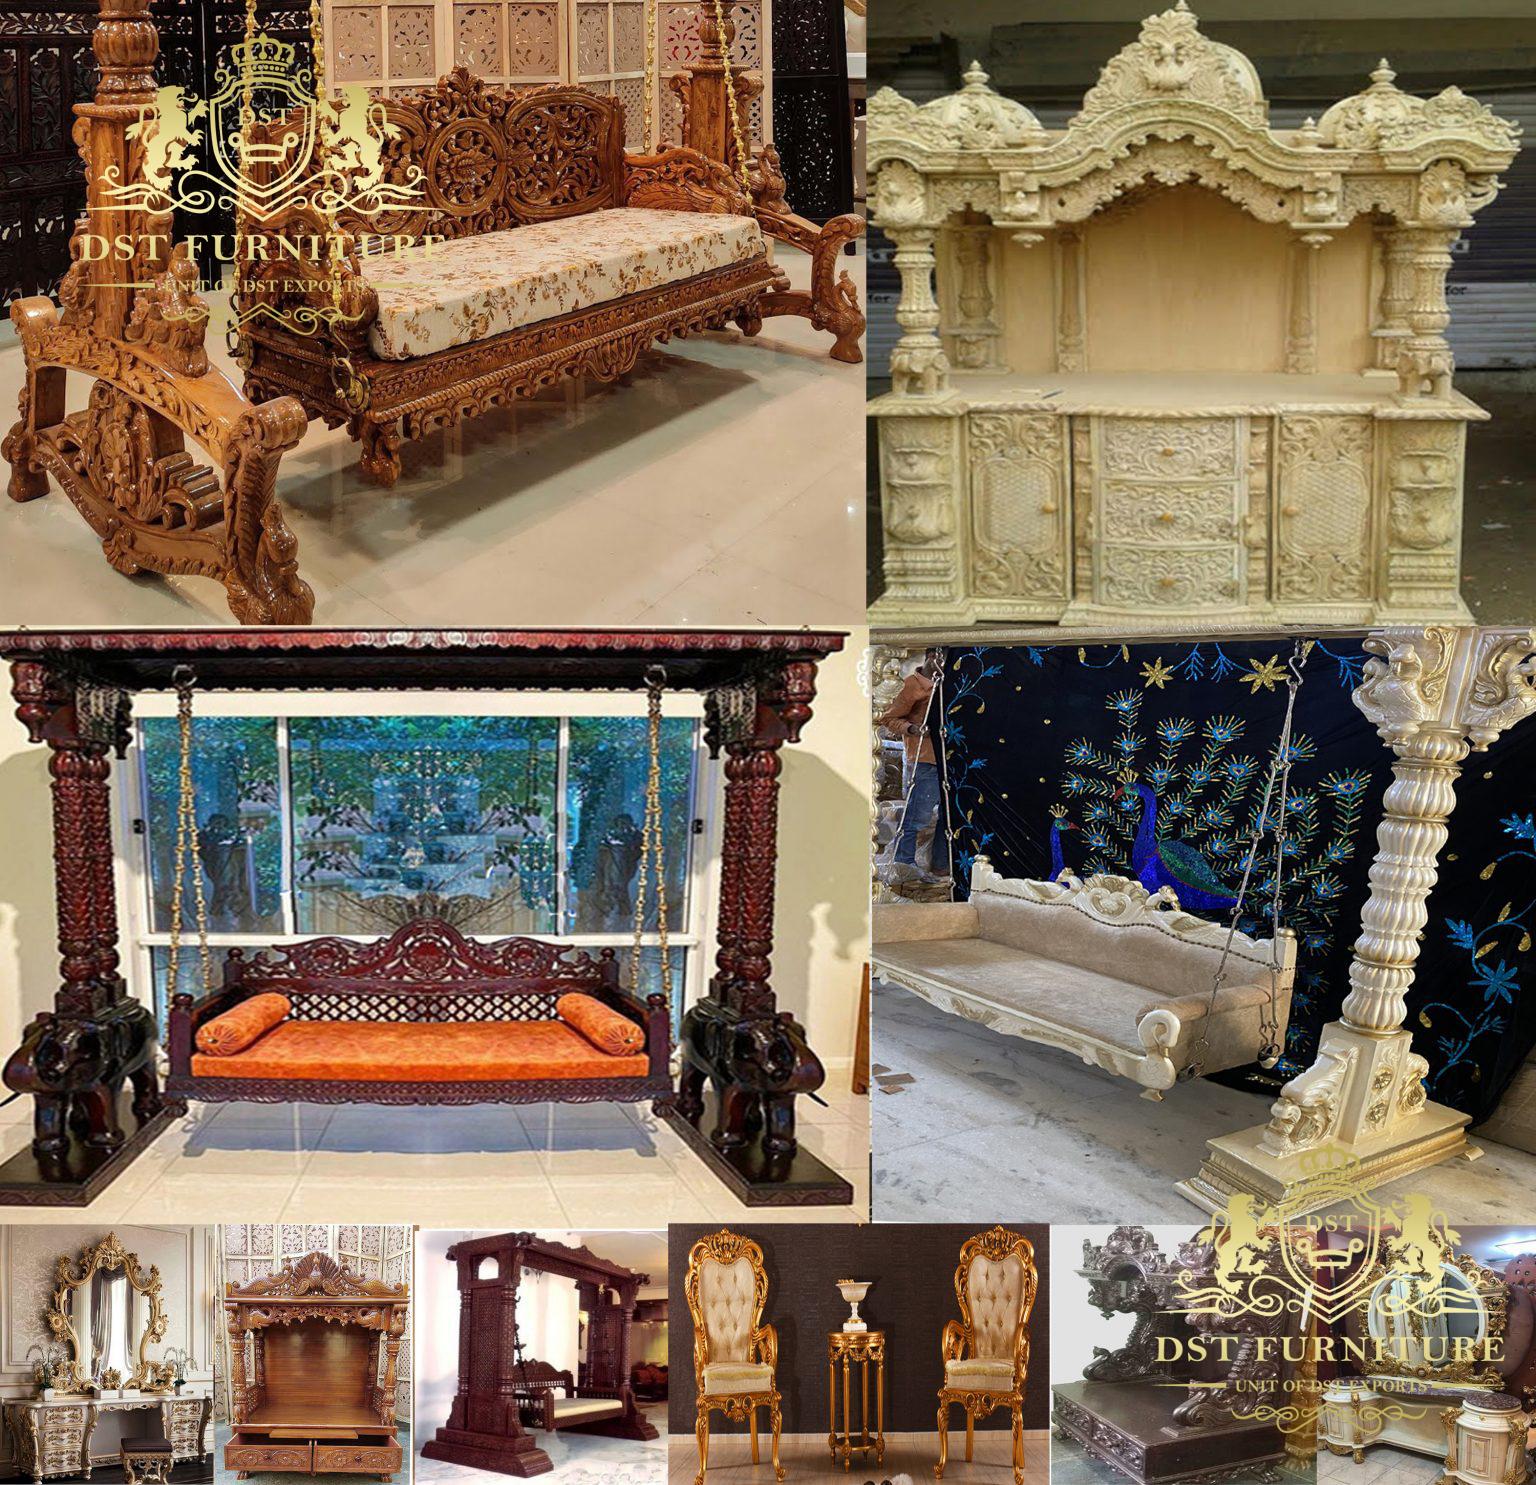 Home-Furniture-Temple-Swing-Dresser-1536x1485 copy.jpg